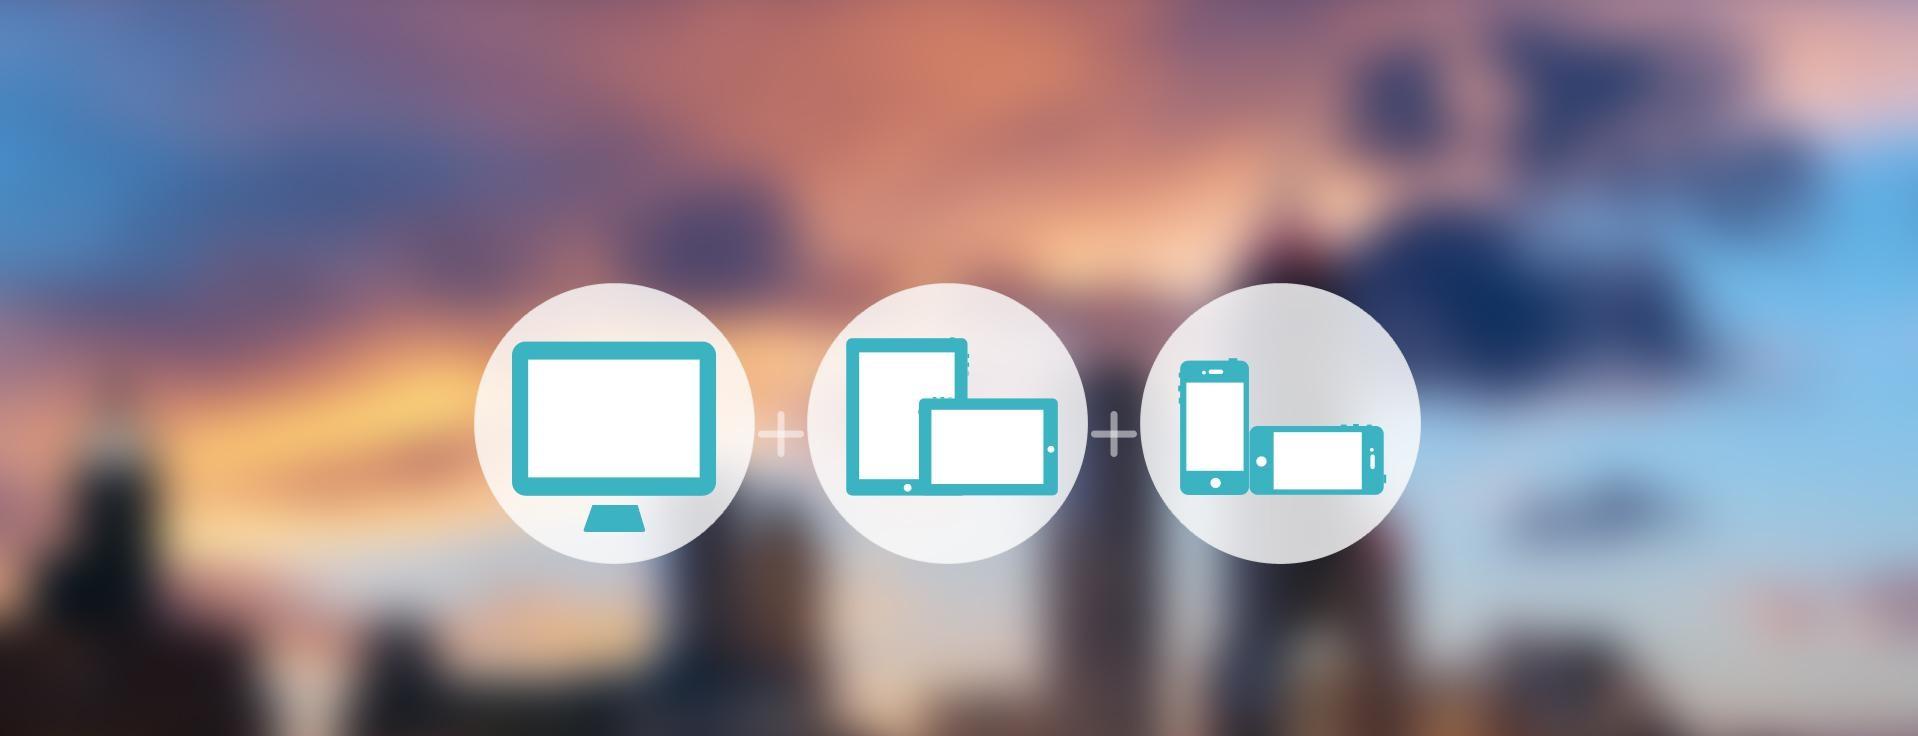 implement-a-responsive-website-design